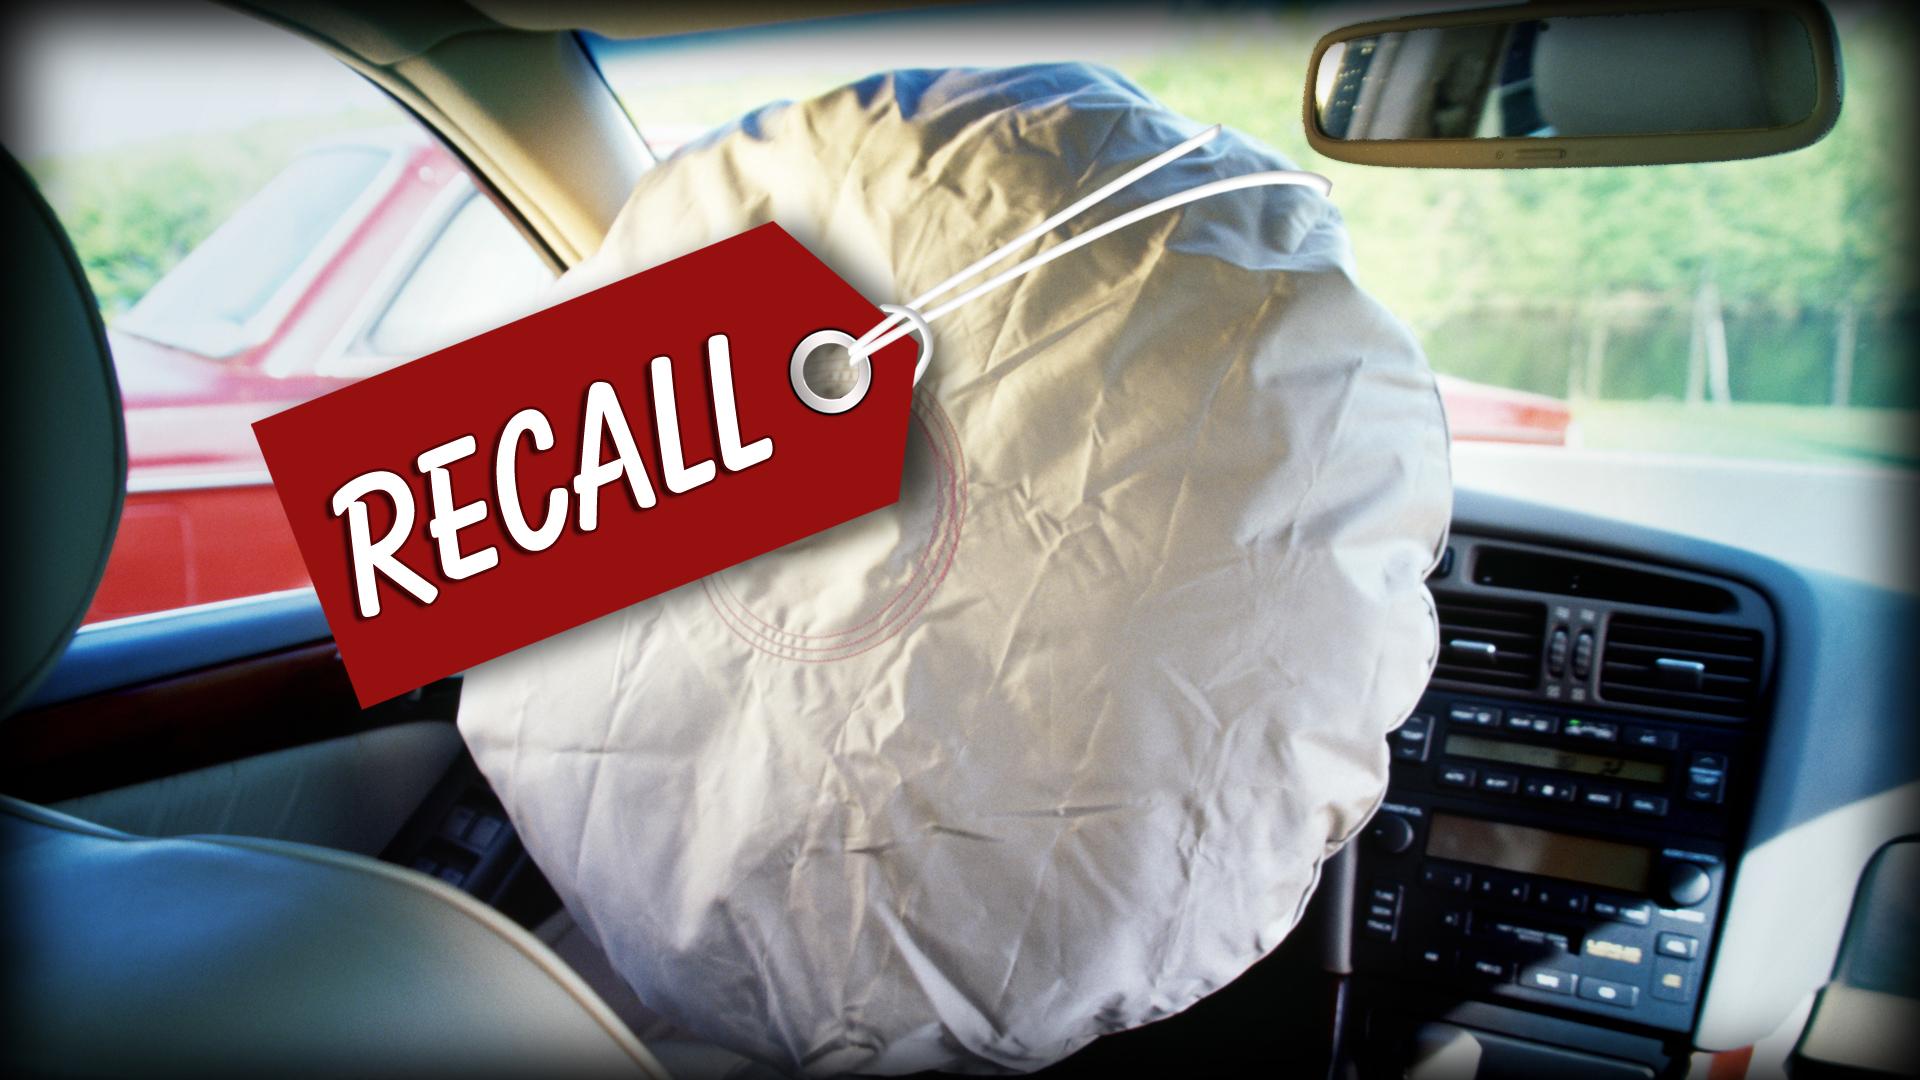 RECALL-monitor-air-bag1